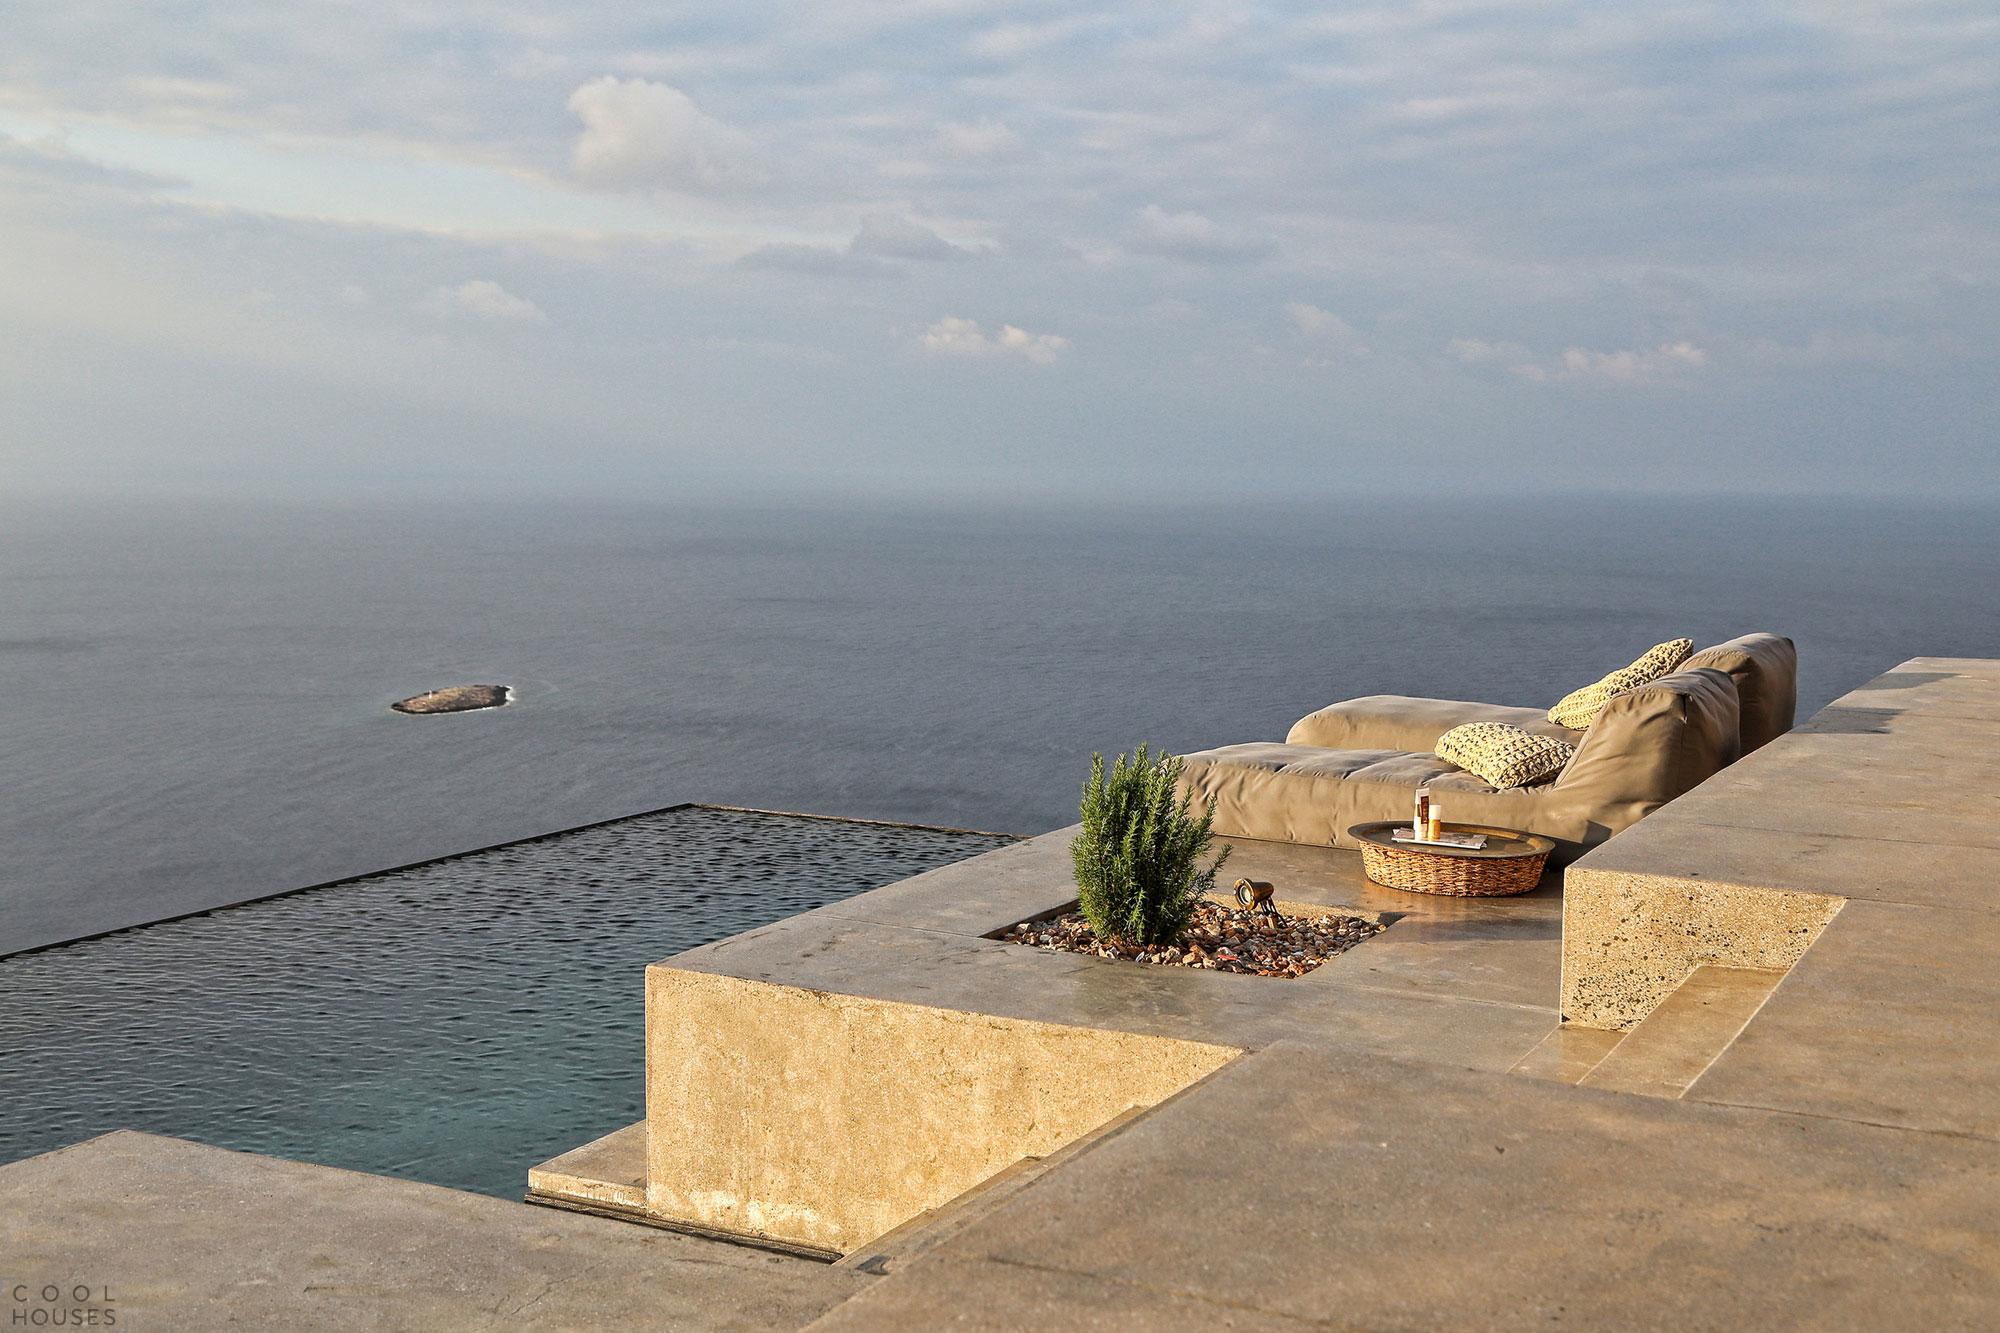 Летняя резиденция в греческом стиле на солнечном острове Сирос, Греция